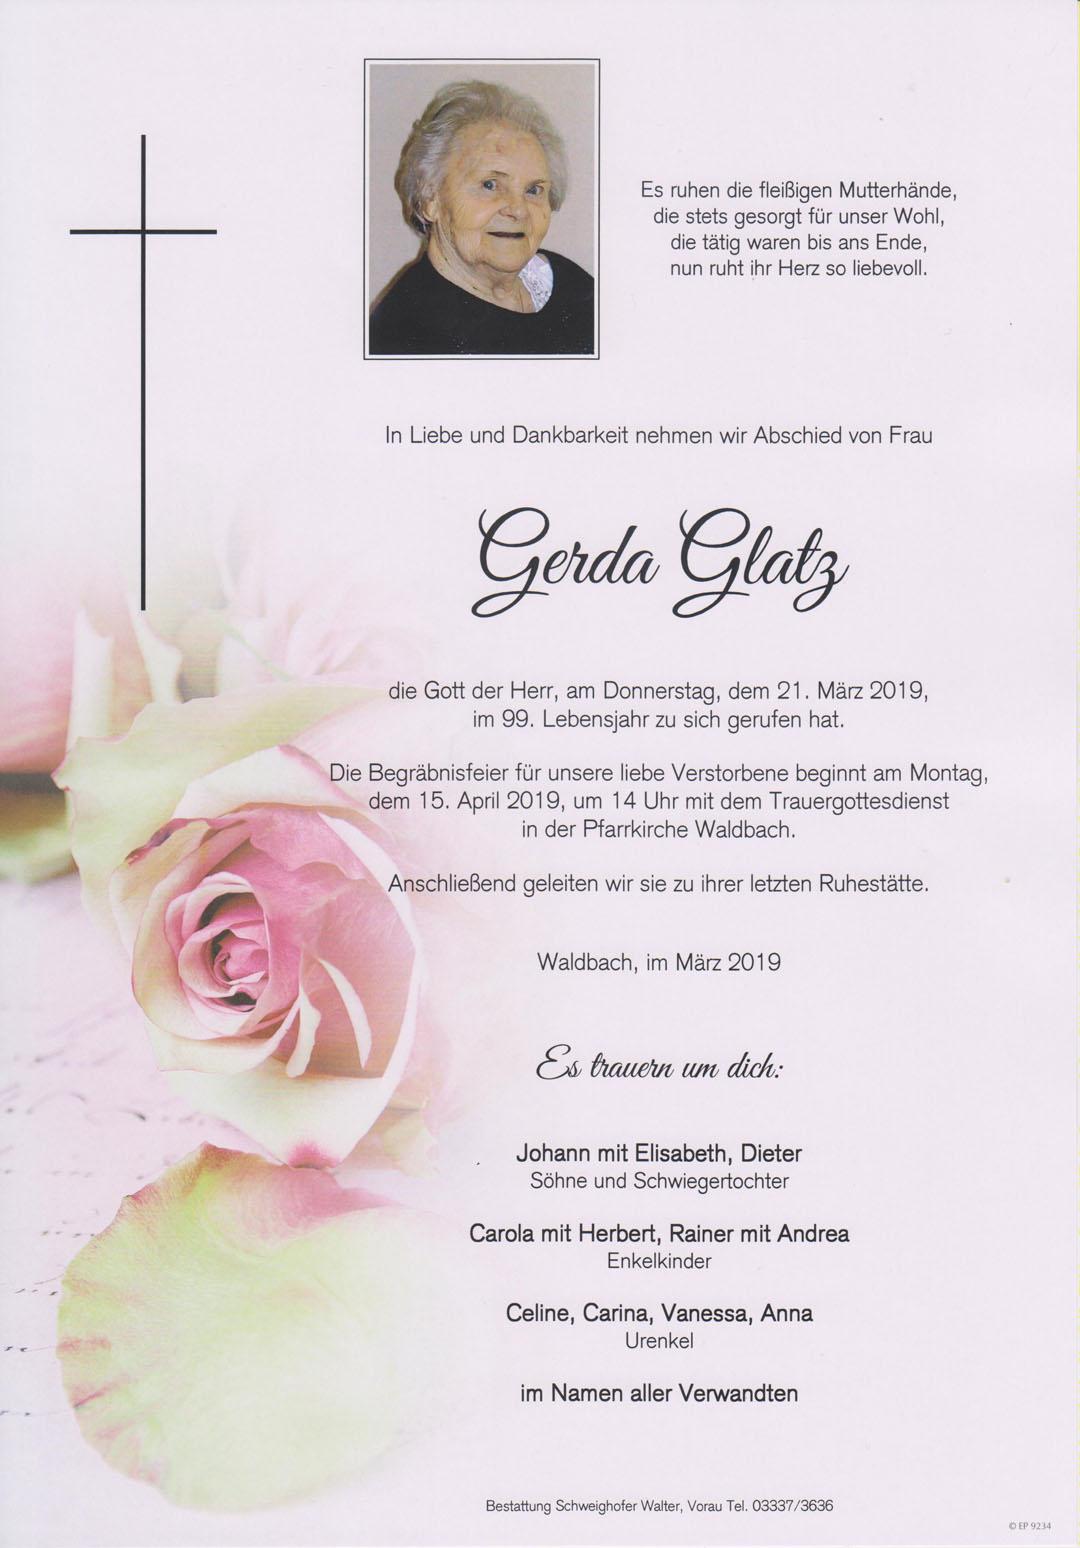 Gerda Glatz